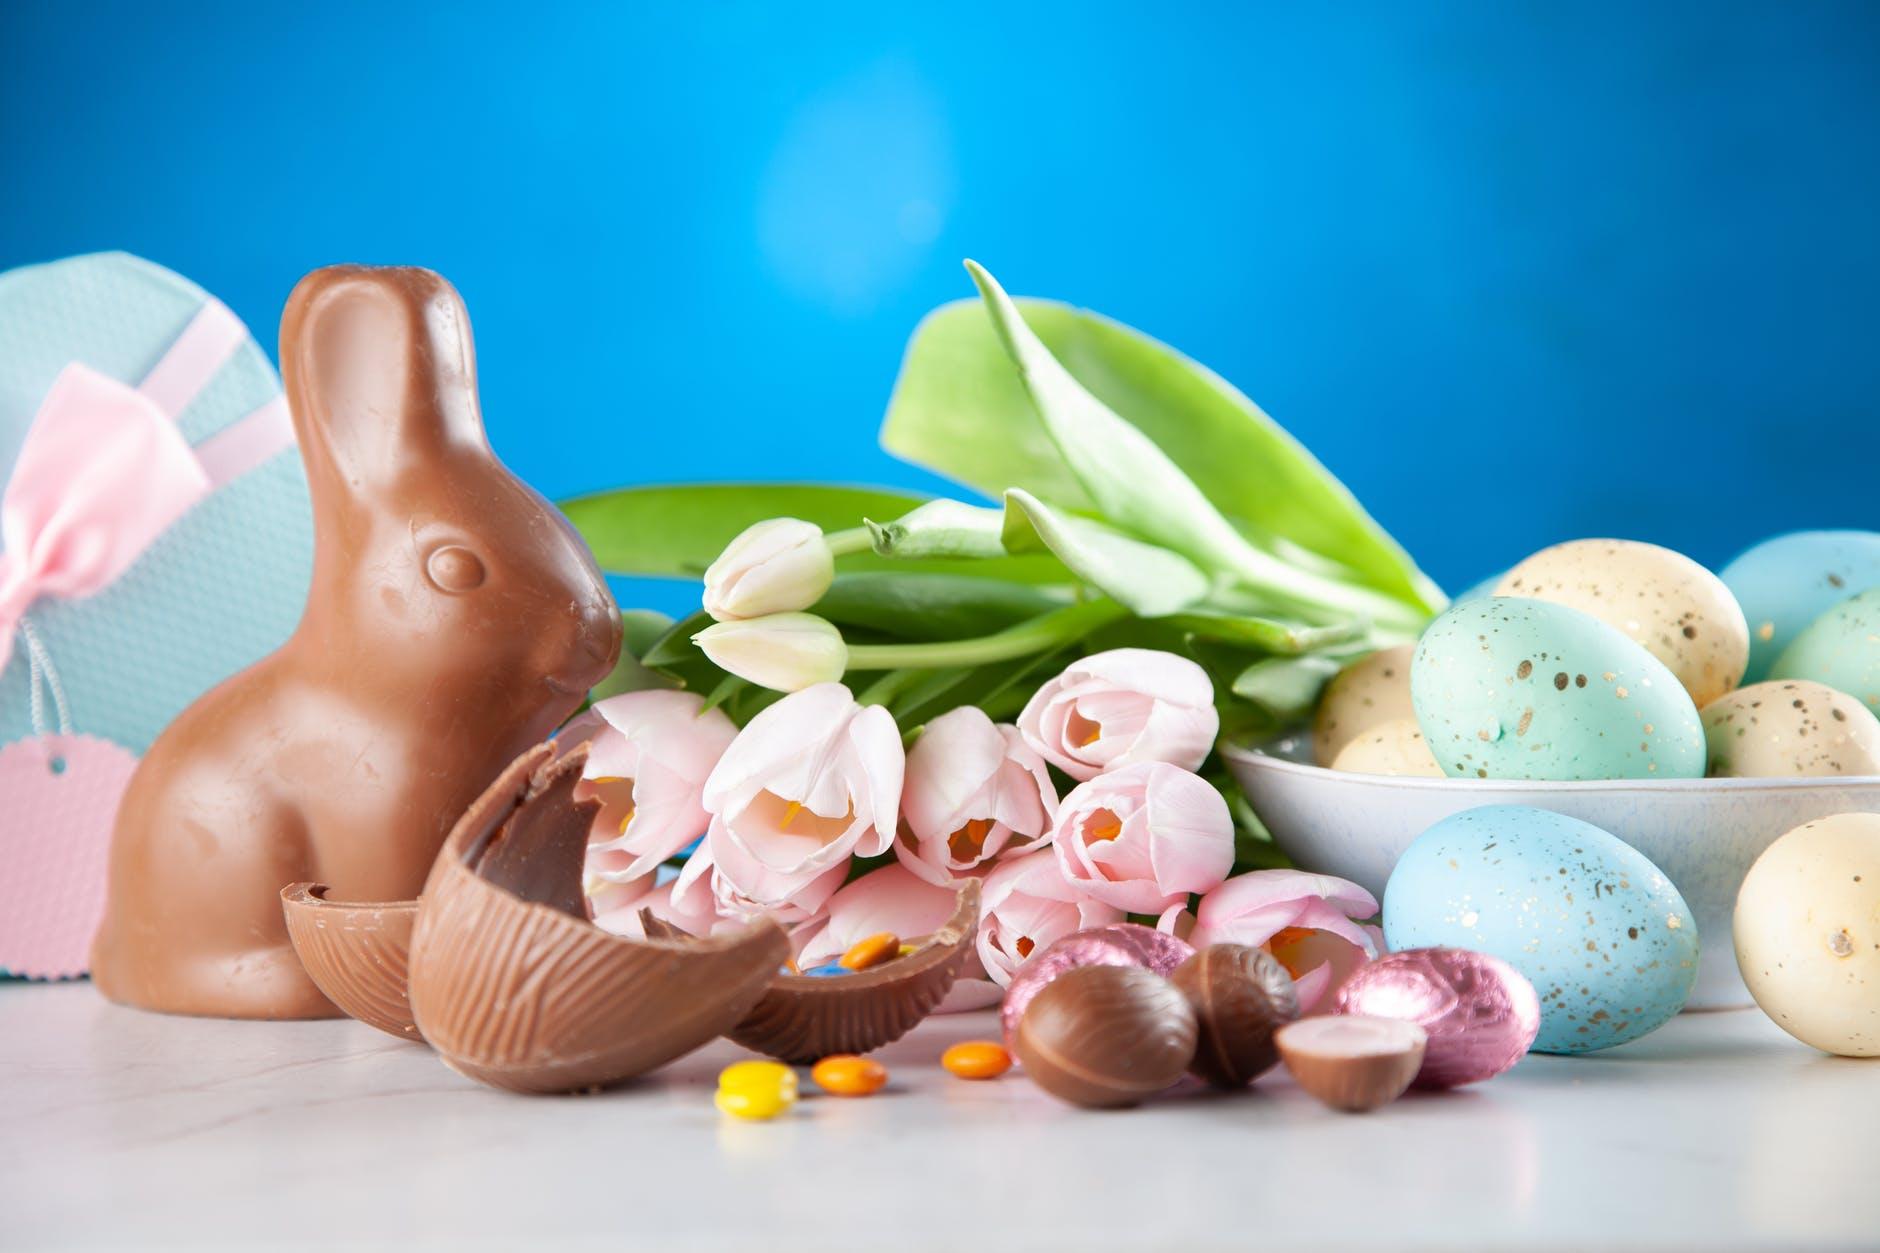 Buona Pasqua da Groupon!